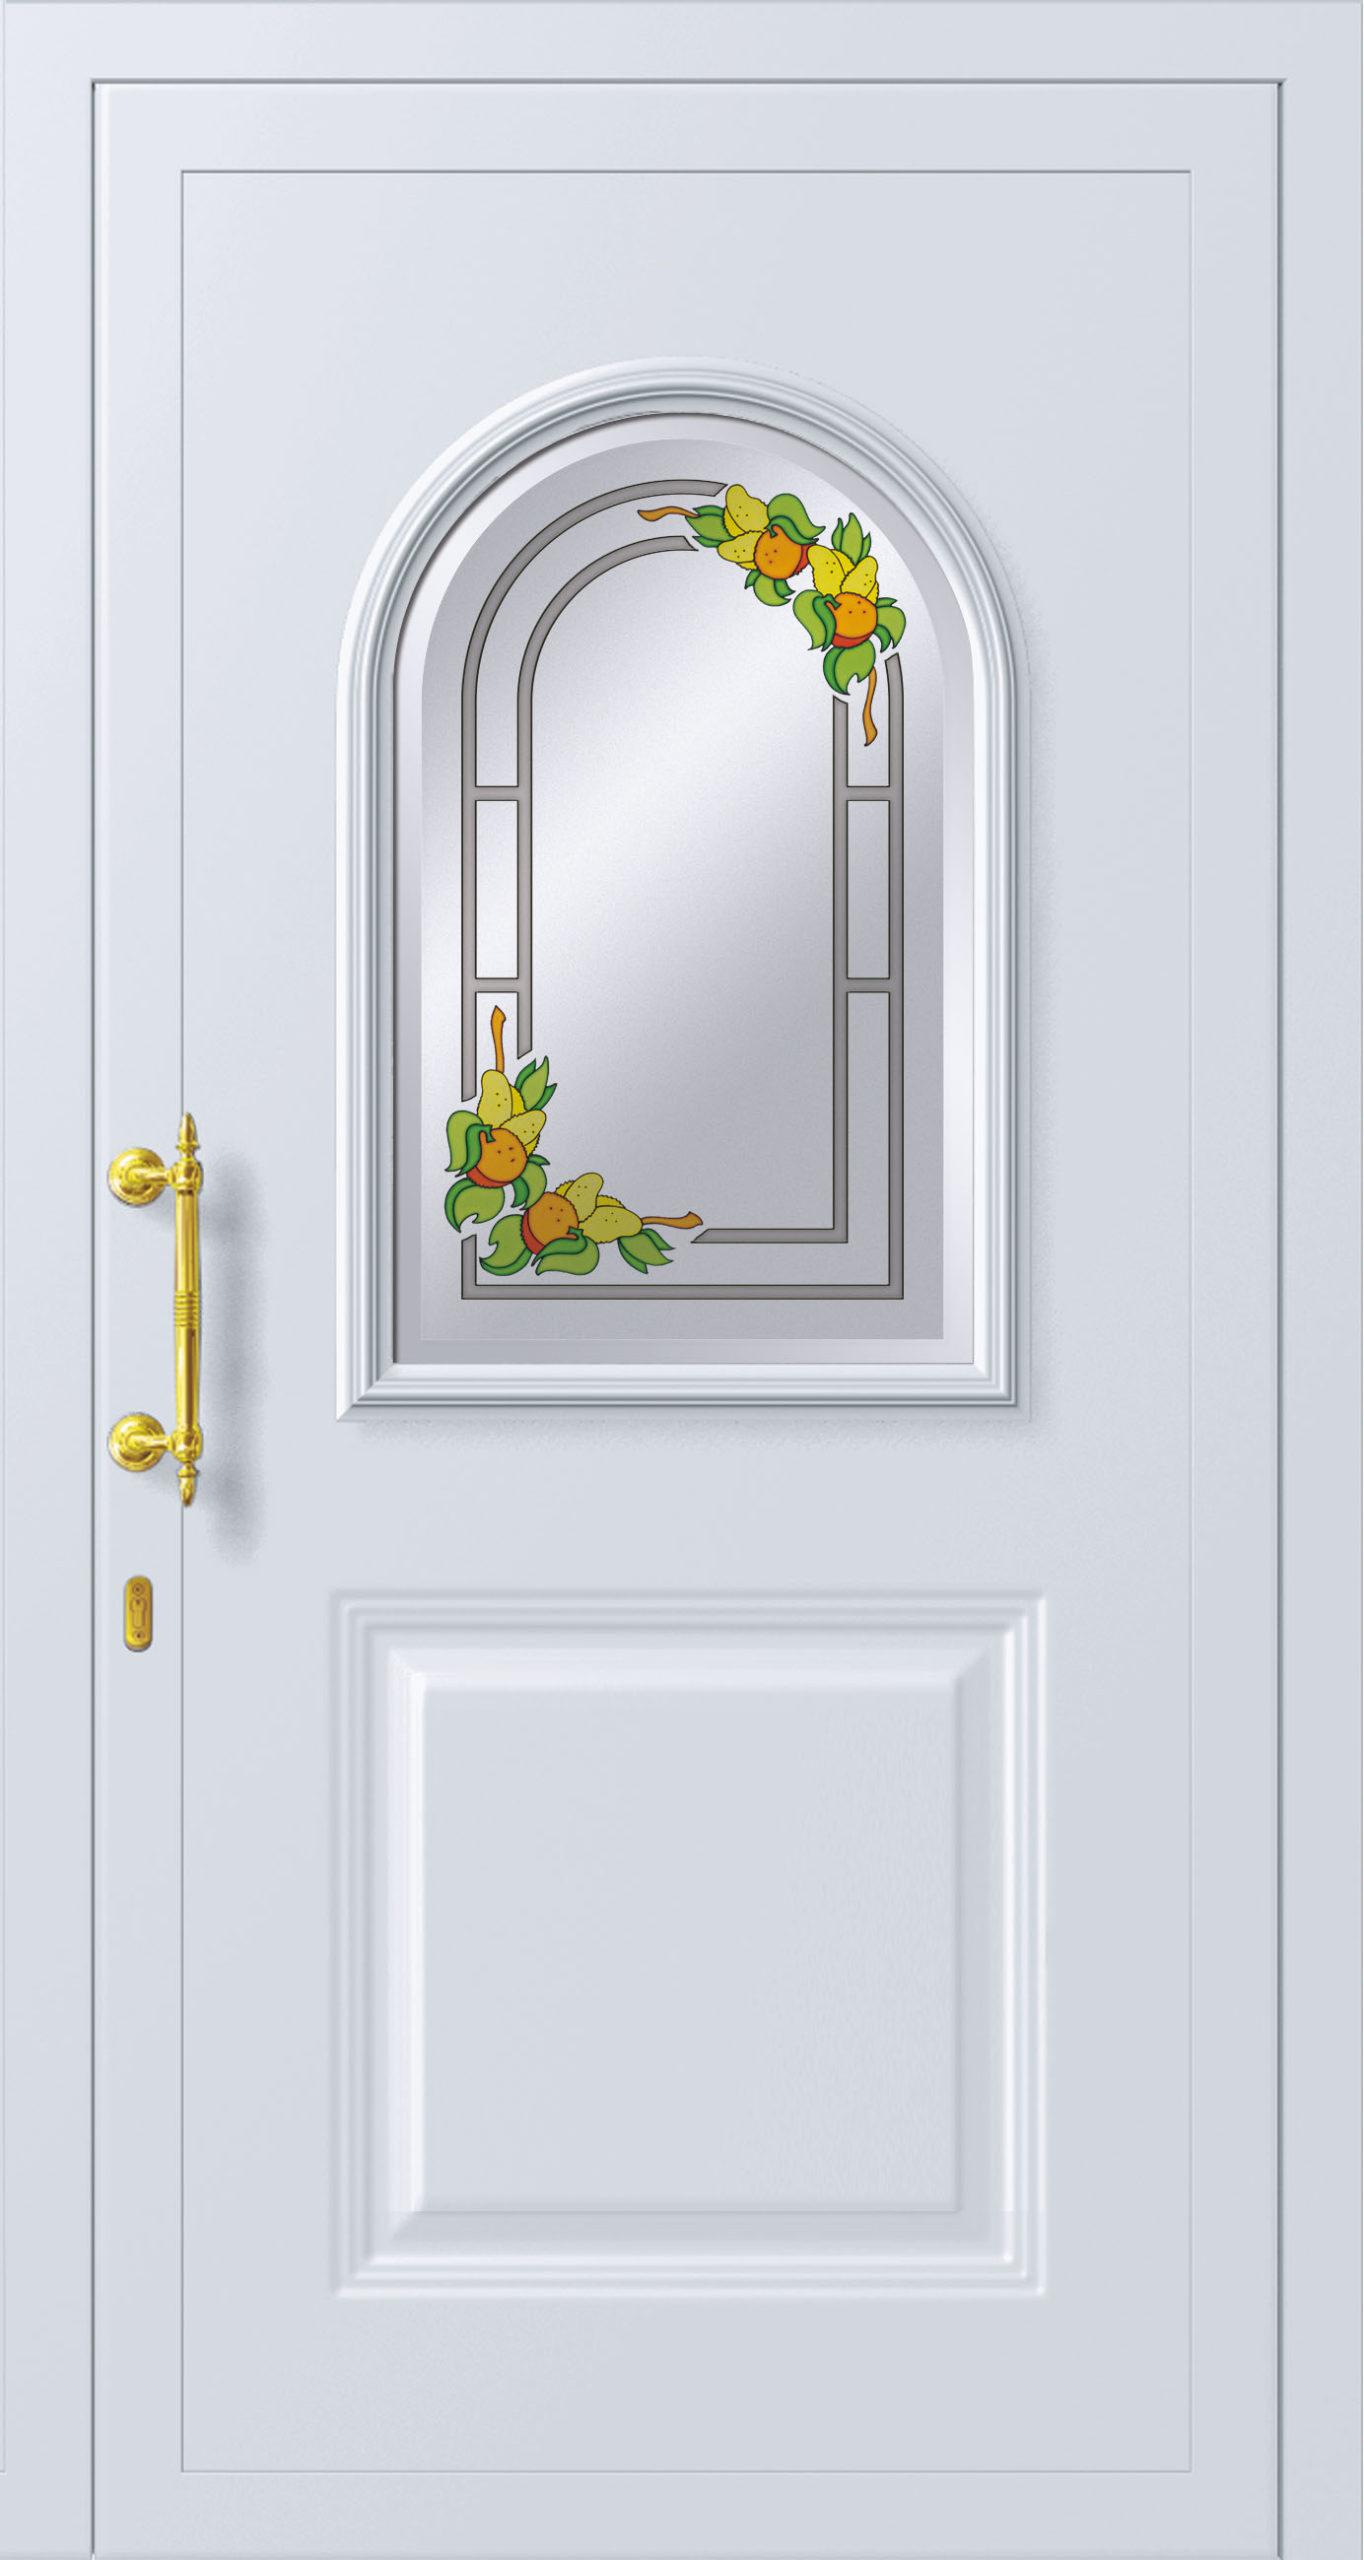 Entry Doors Linea Classica 106